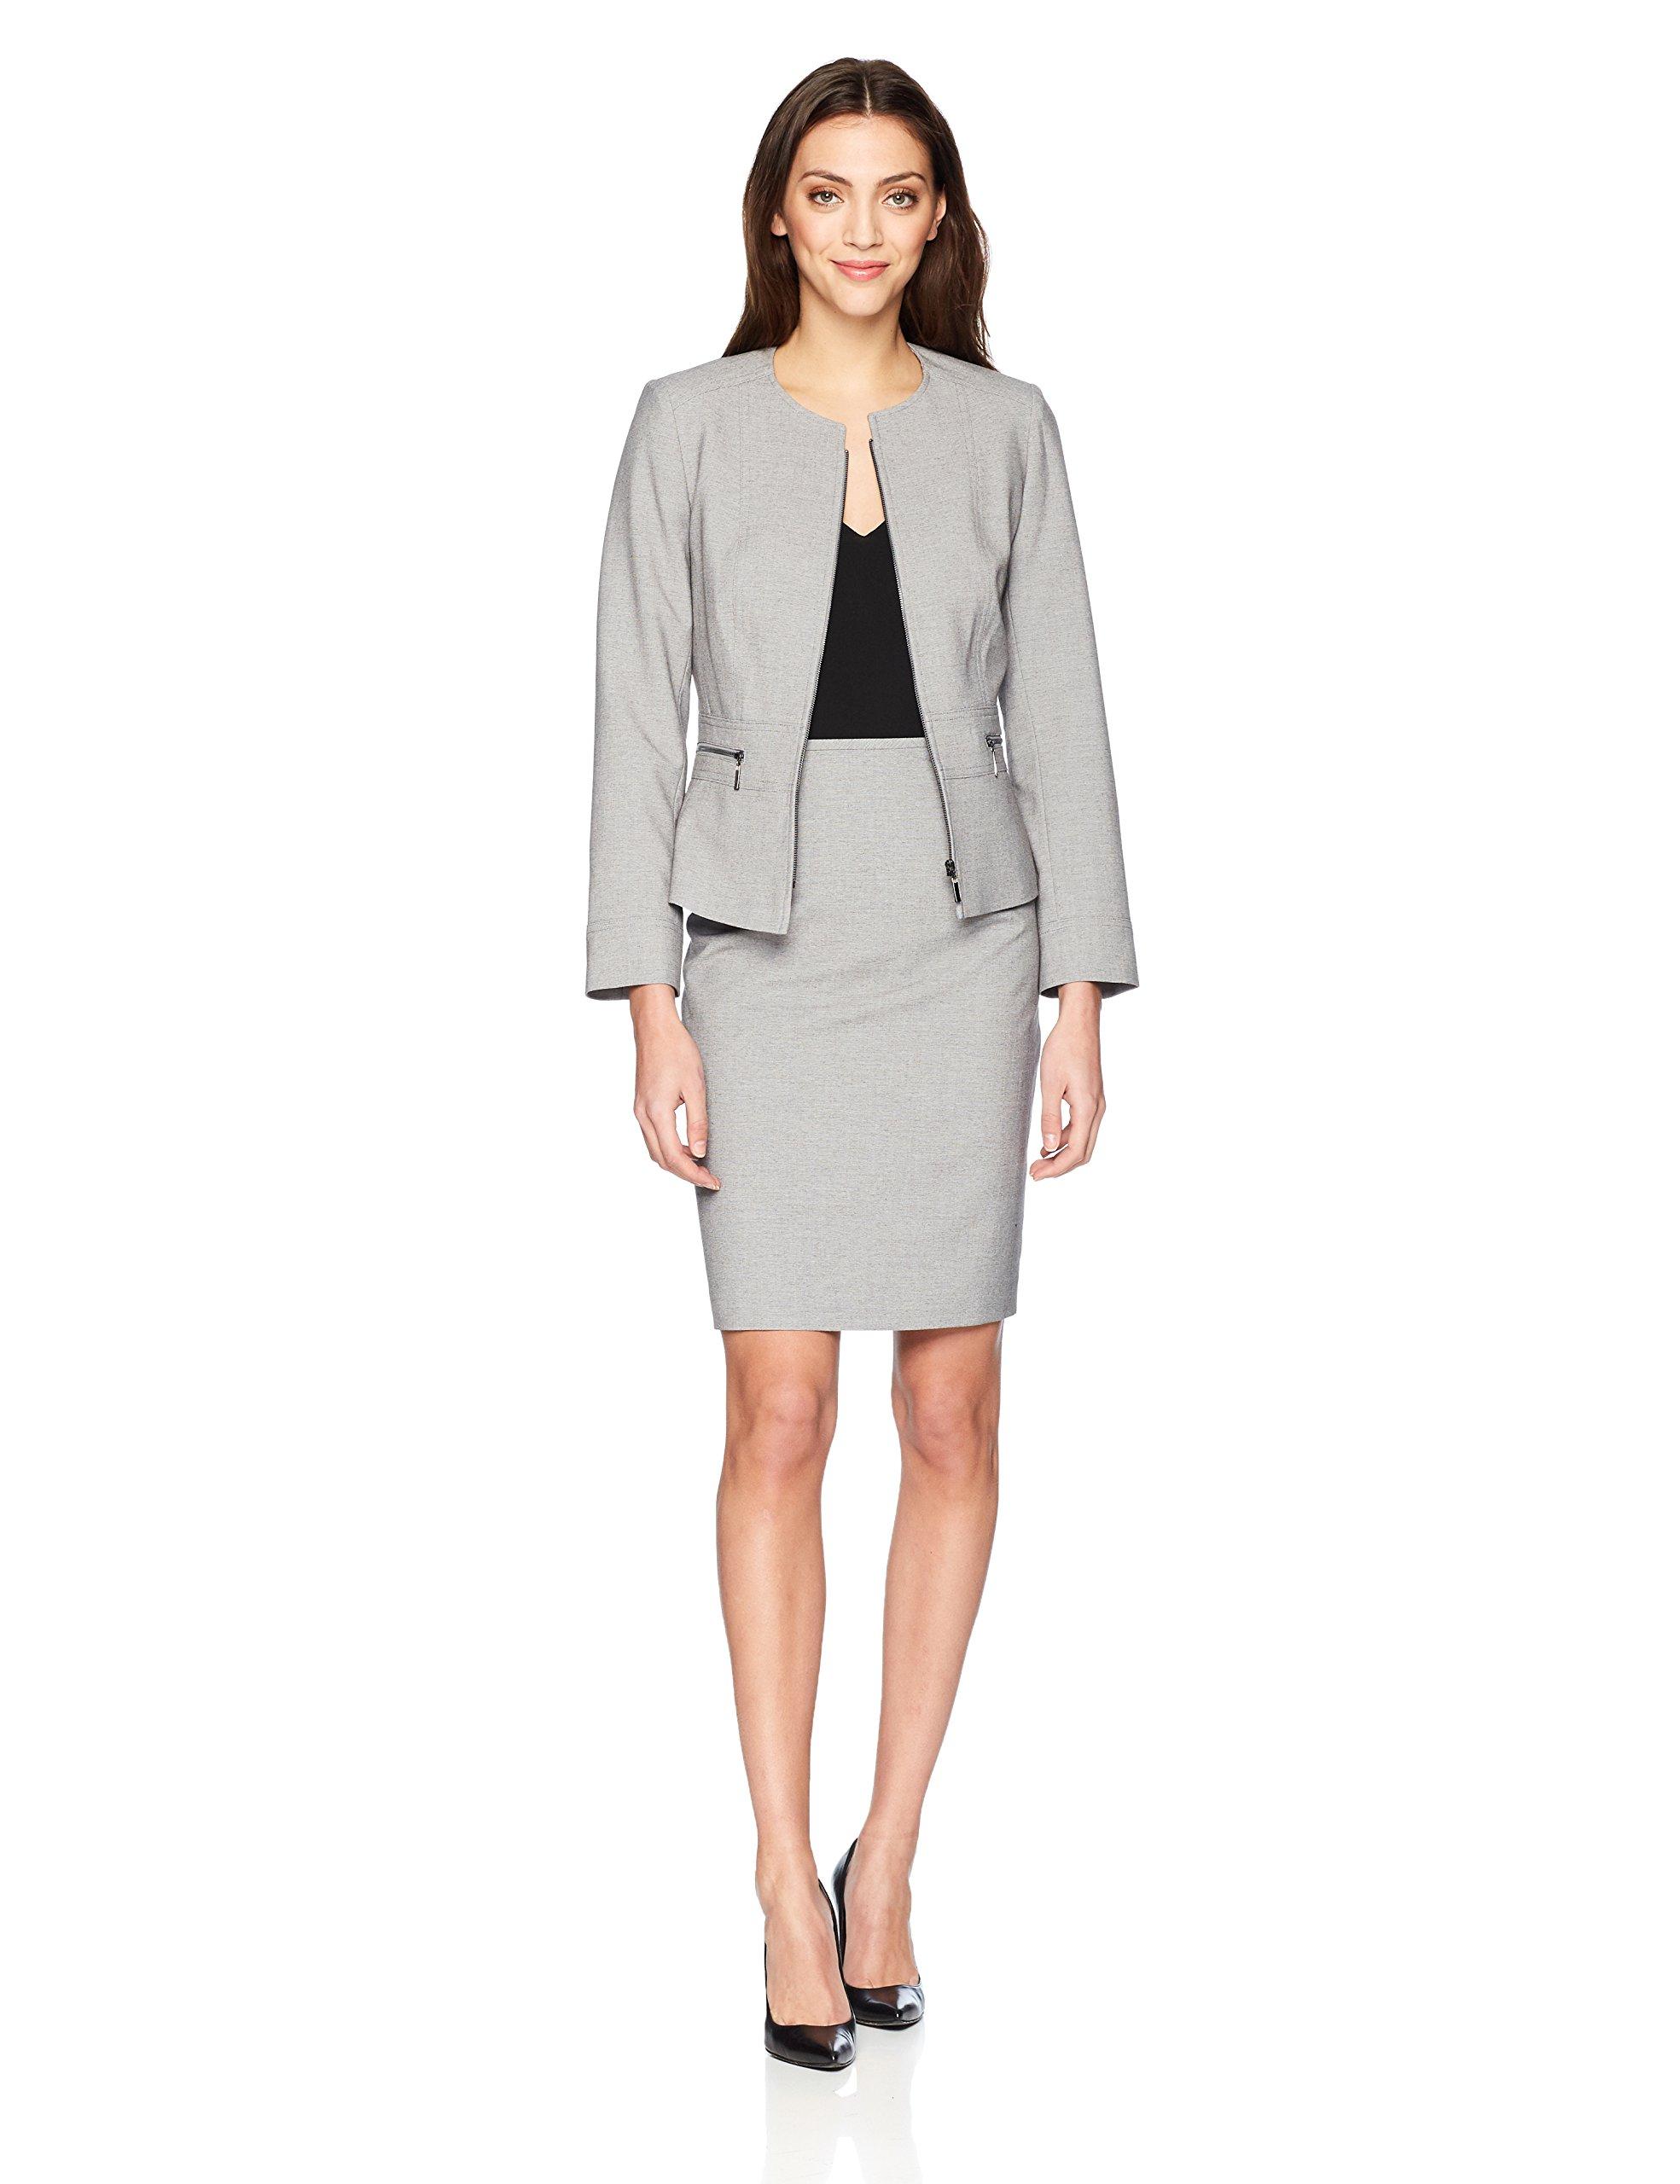 6d6c583cbae3b Get Quotations · Tahari by Arthur S. Levine Women's Cross Dye Skirt Suit  With Full Front Zipper